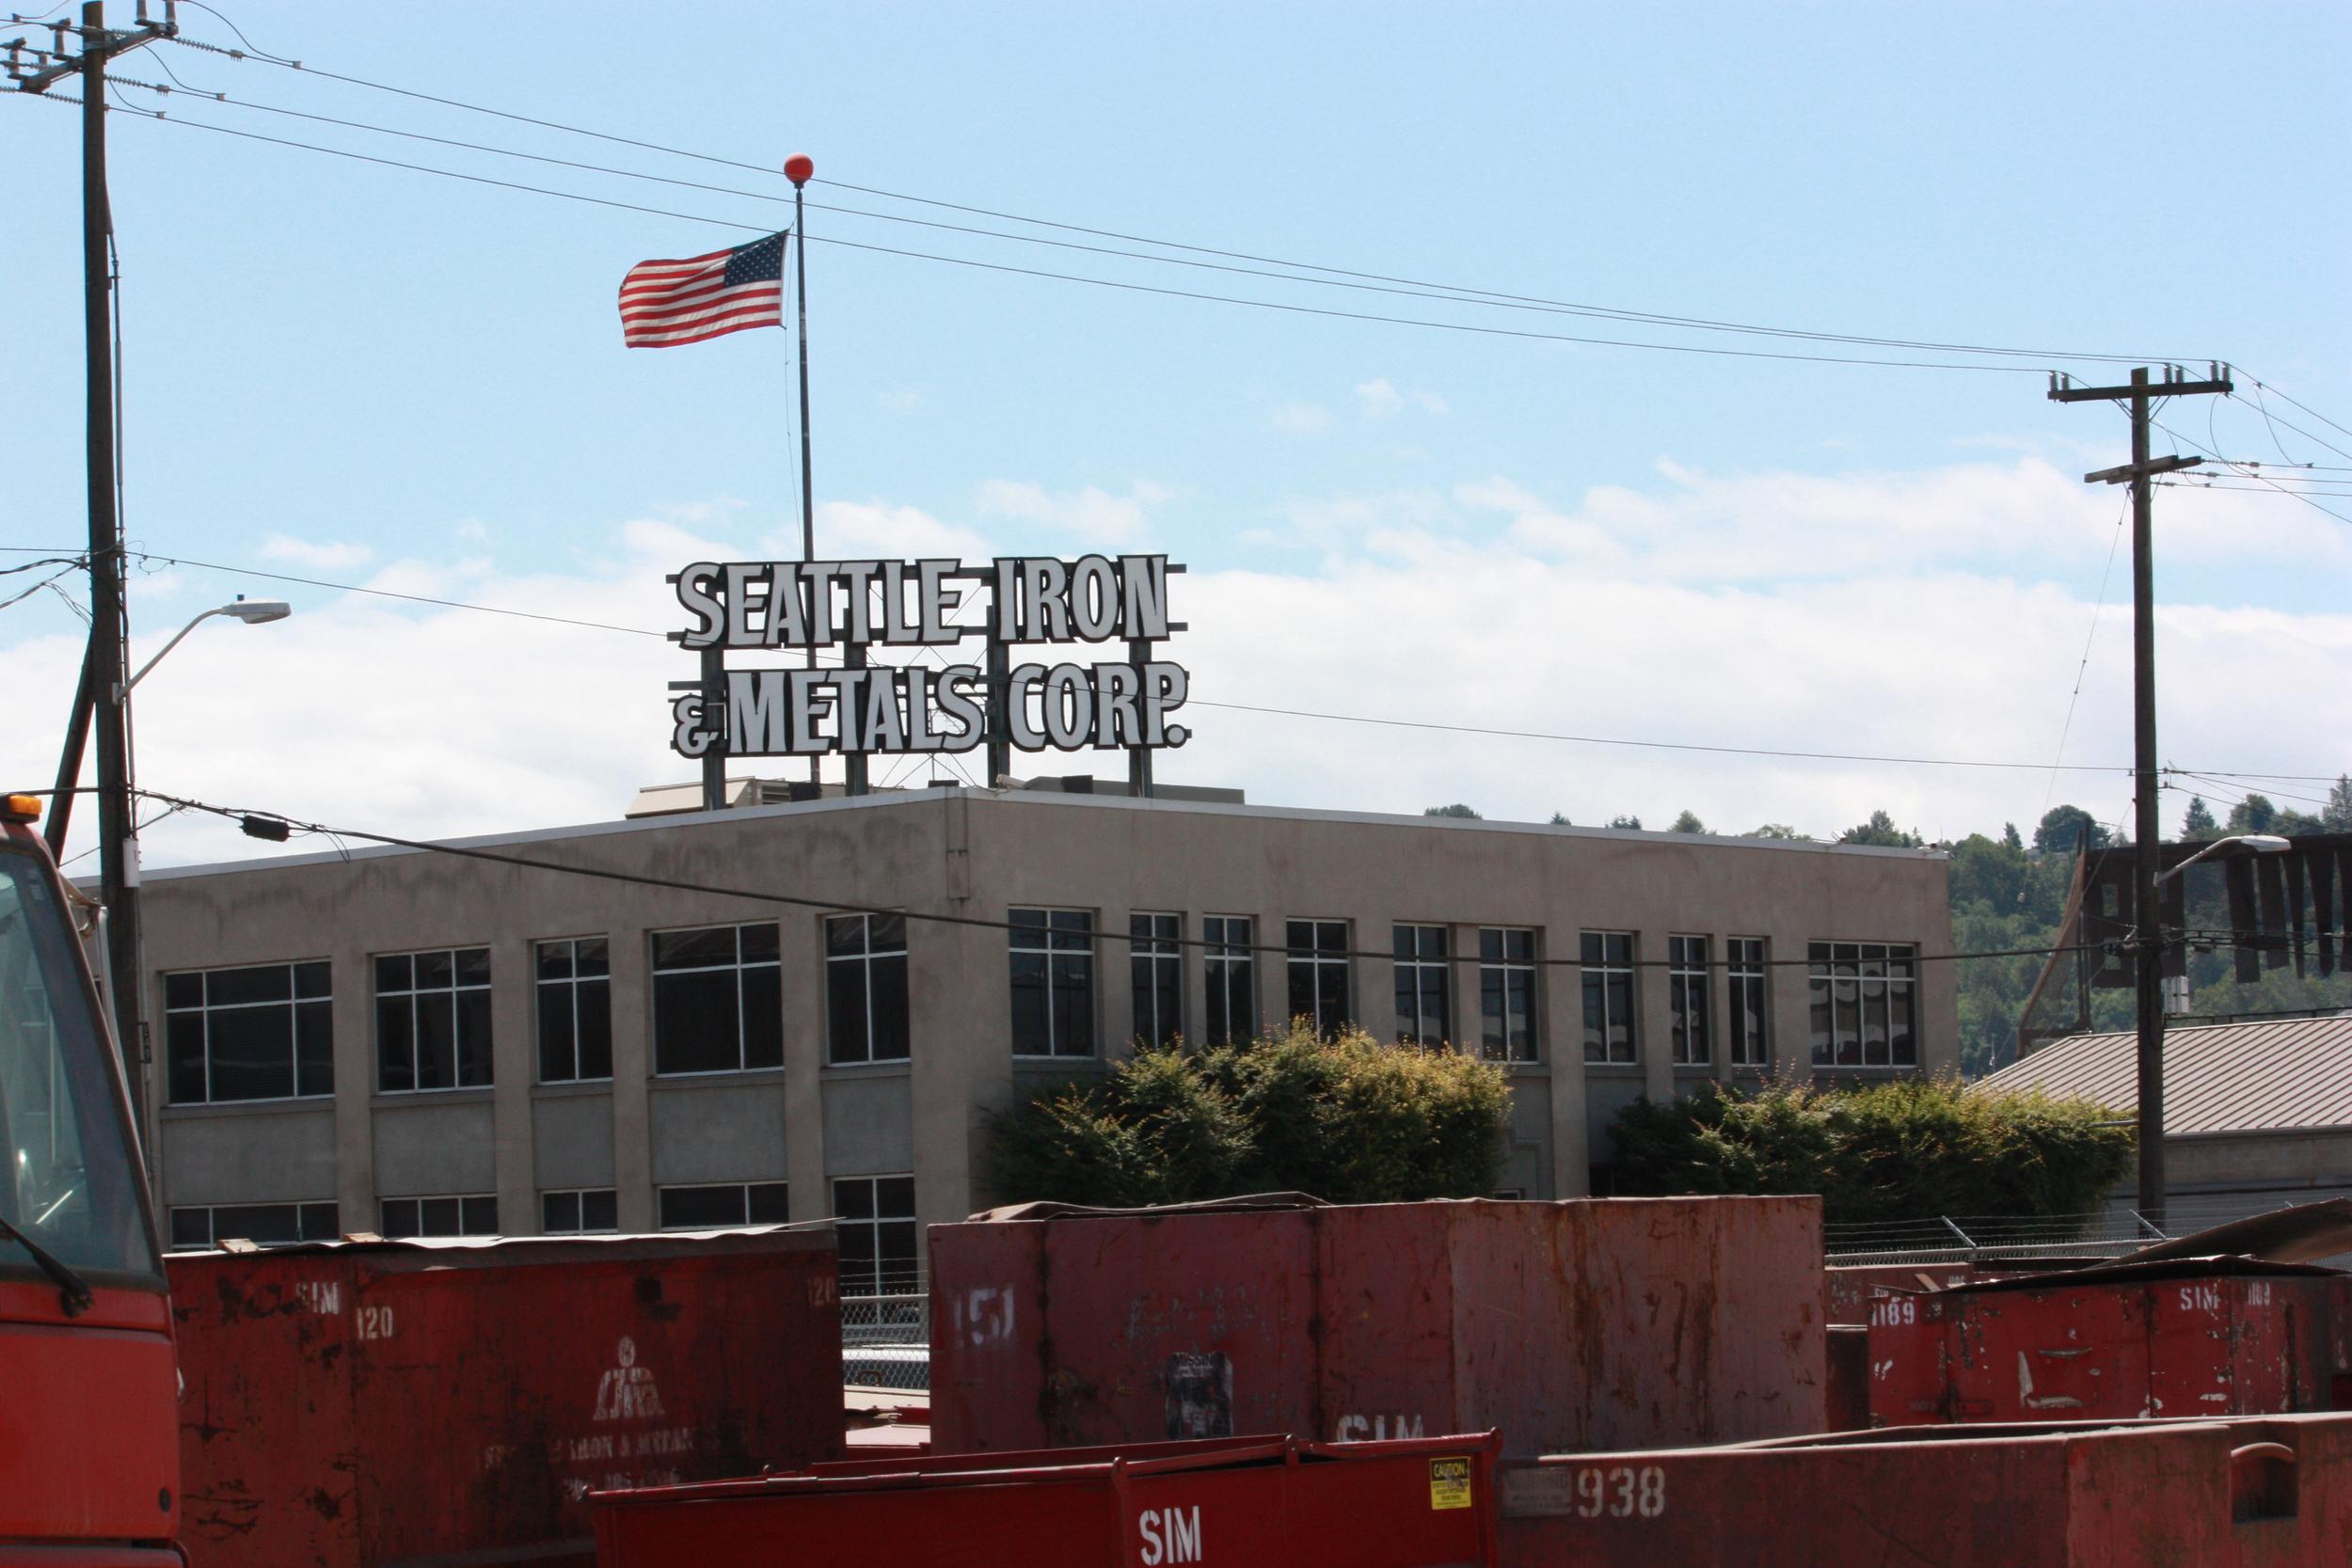 Seattle Iron & Metals Corp. Metal & Scrap Recycing